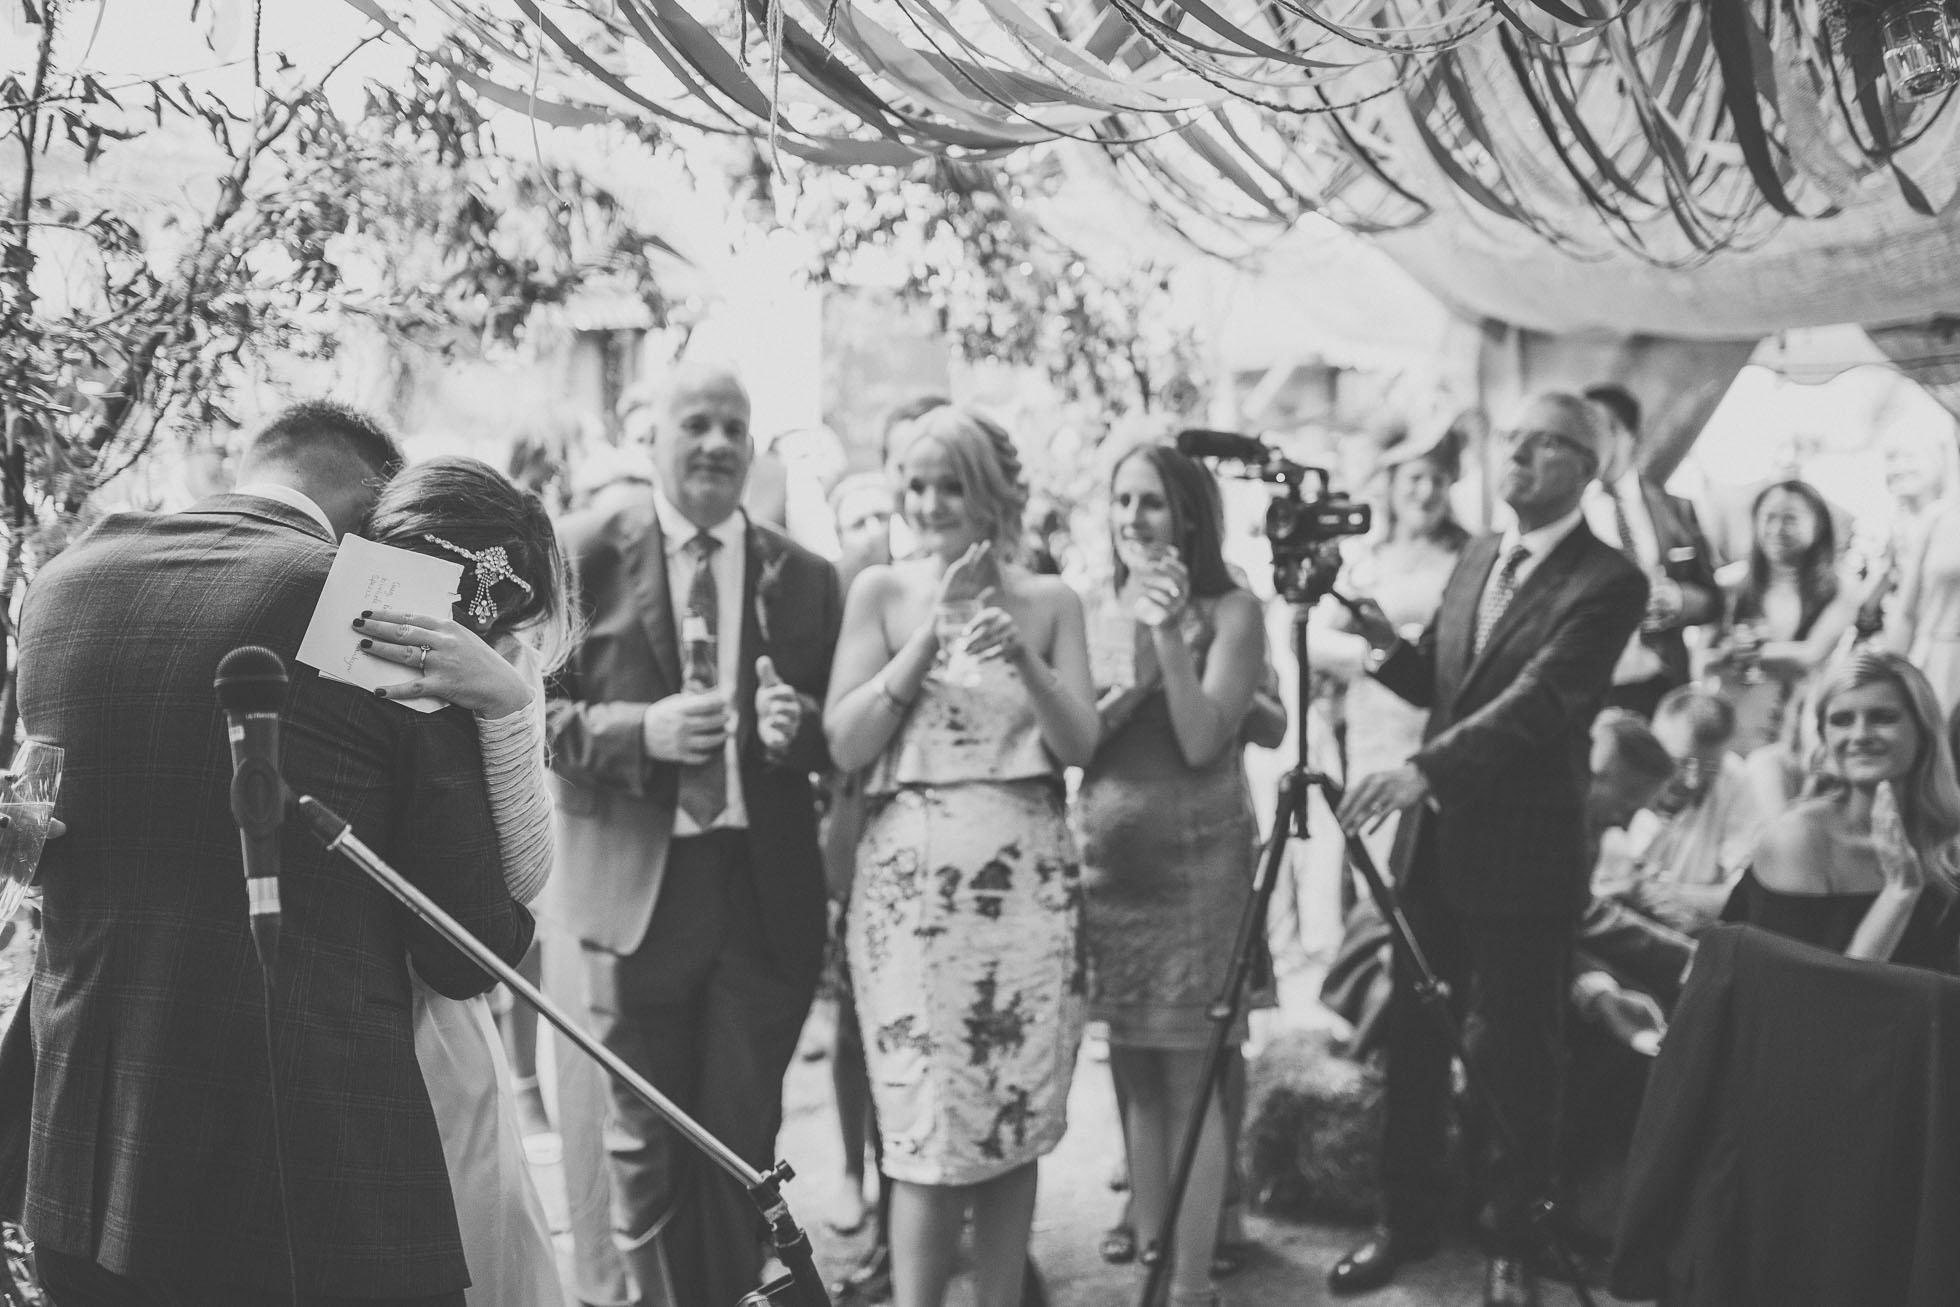 sheffield-botanical-gardens-wedding-photographer-82.jpg